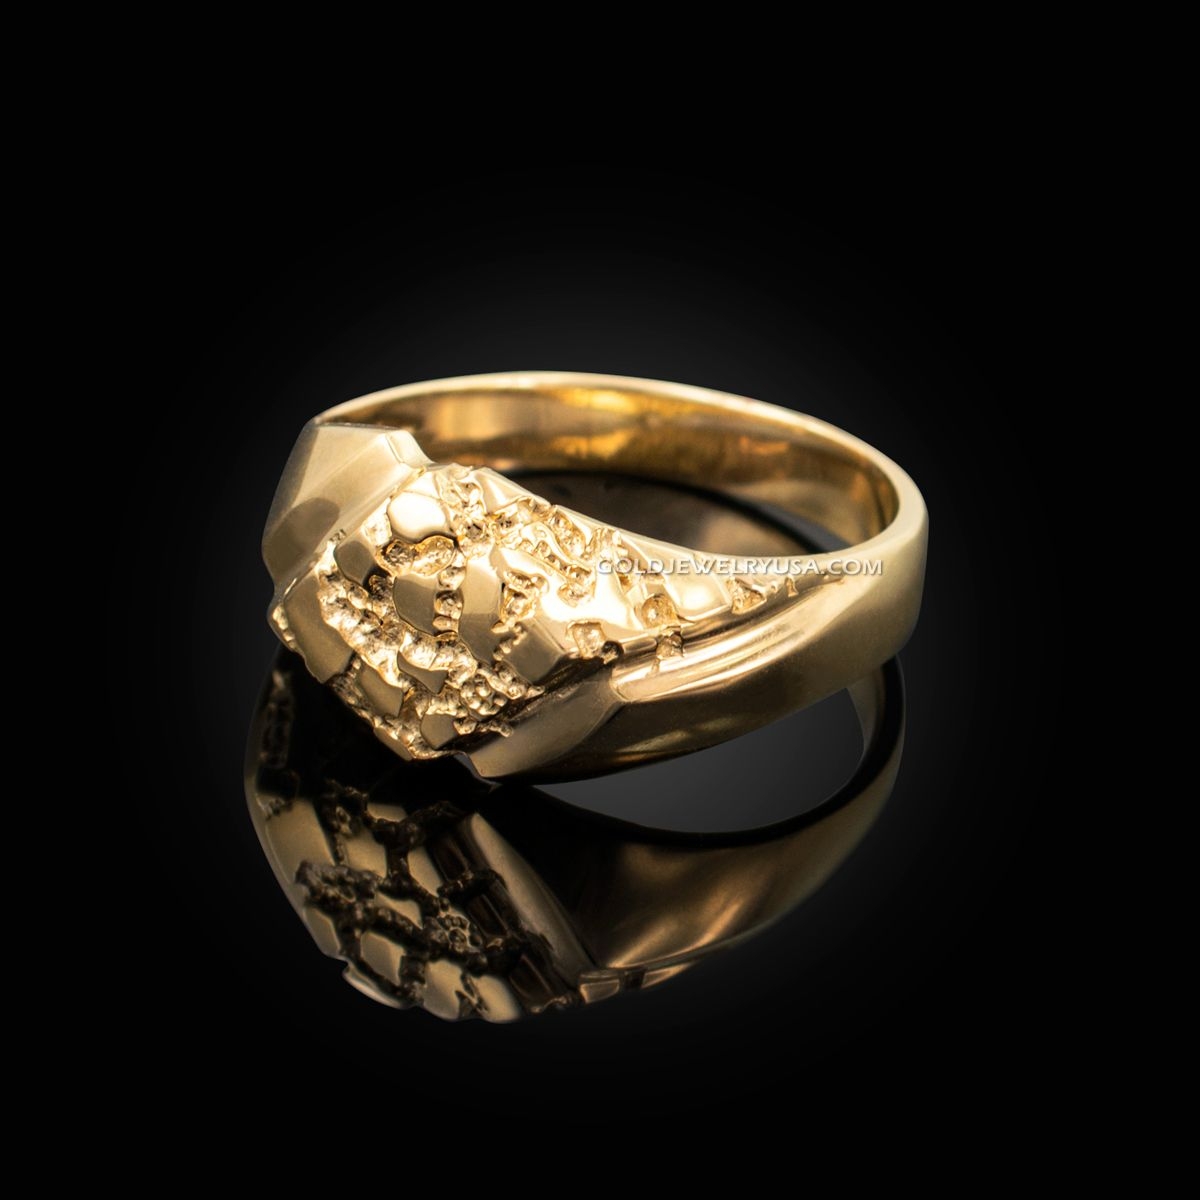 Mens Black Onyx August Birthstone Diamond Wedding band Ring 10K SOLID White Gold